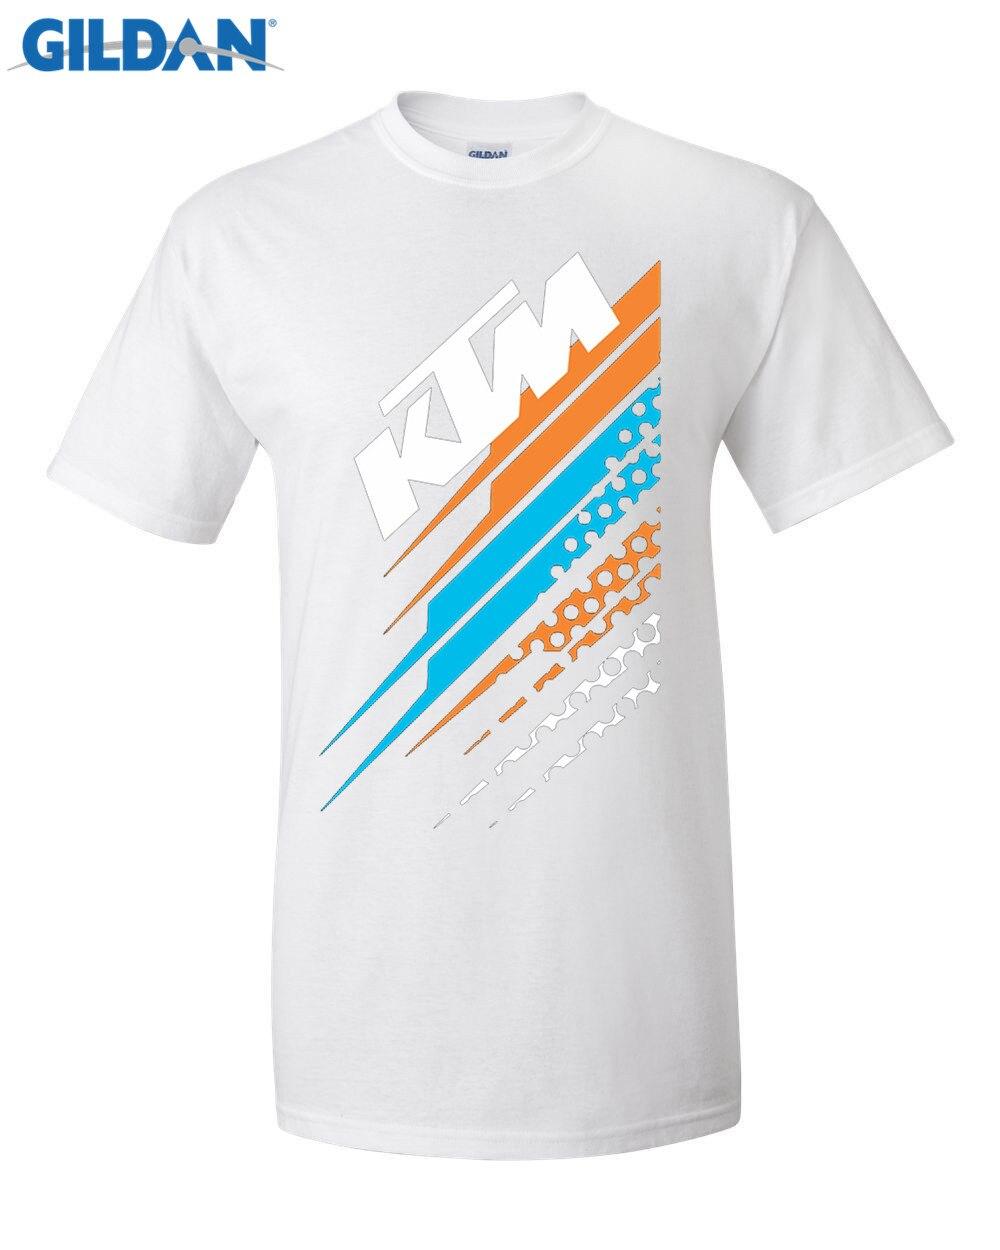 Design t shirt gildan - Gildan Designer T Shirt Men S O Neck Short Funny T Shirt Shirt Crazy Ktm Team Tee Shirt Printing Short Sleeve Casual T Shirt